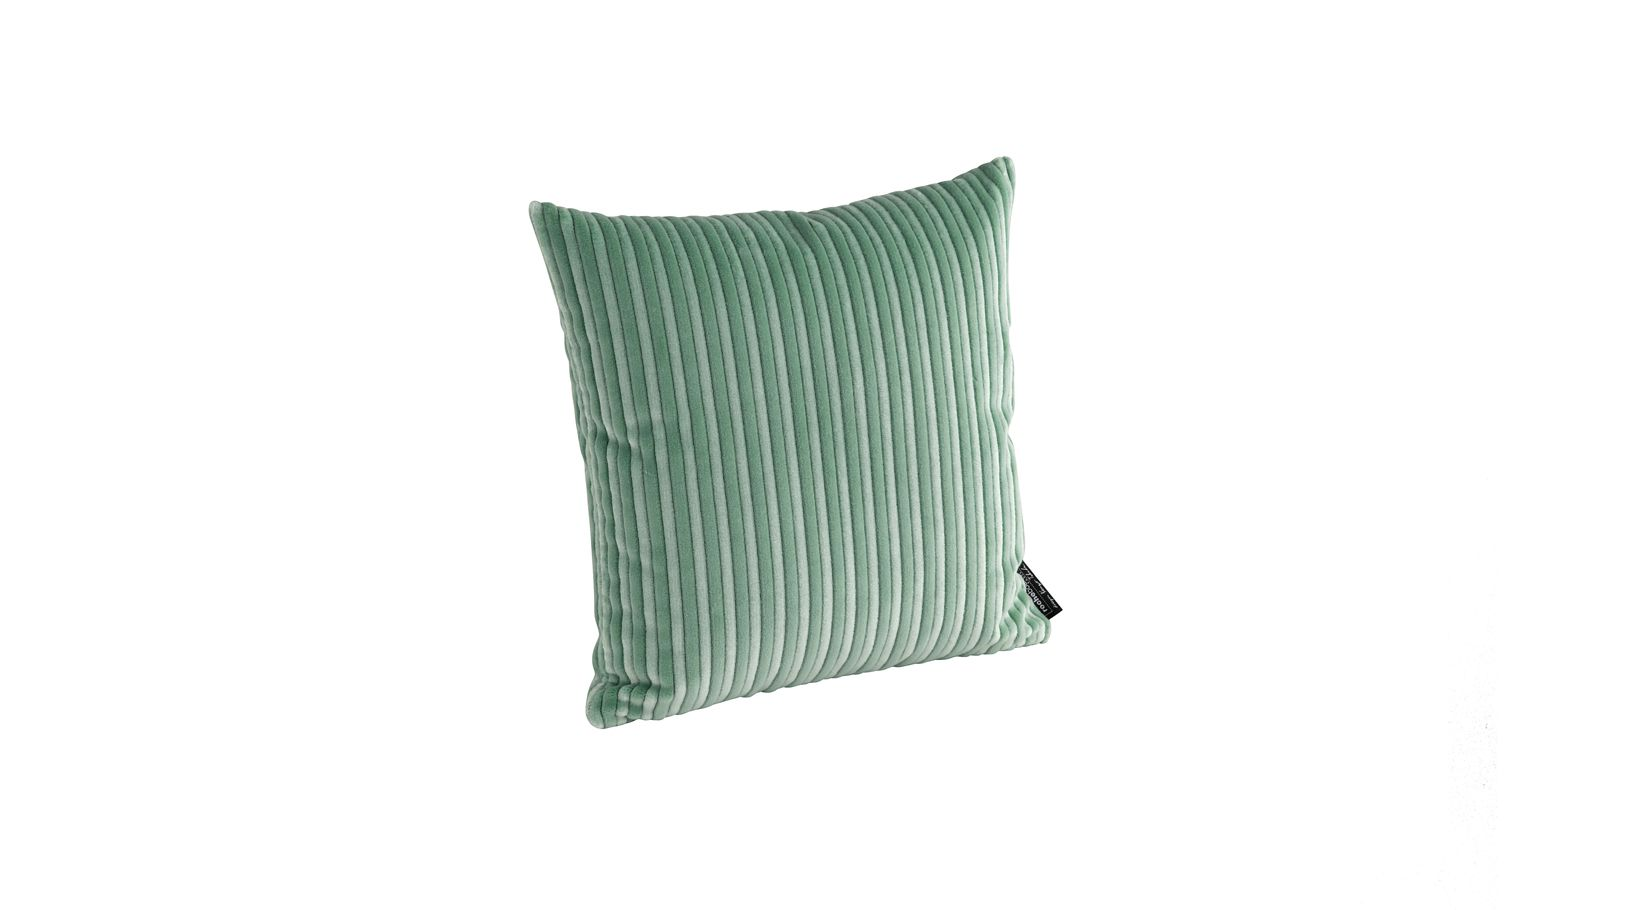 muji coussin roche bobois. Black Bedroom Furniture Sets. Home Design Ideas